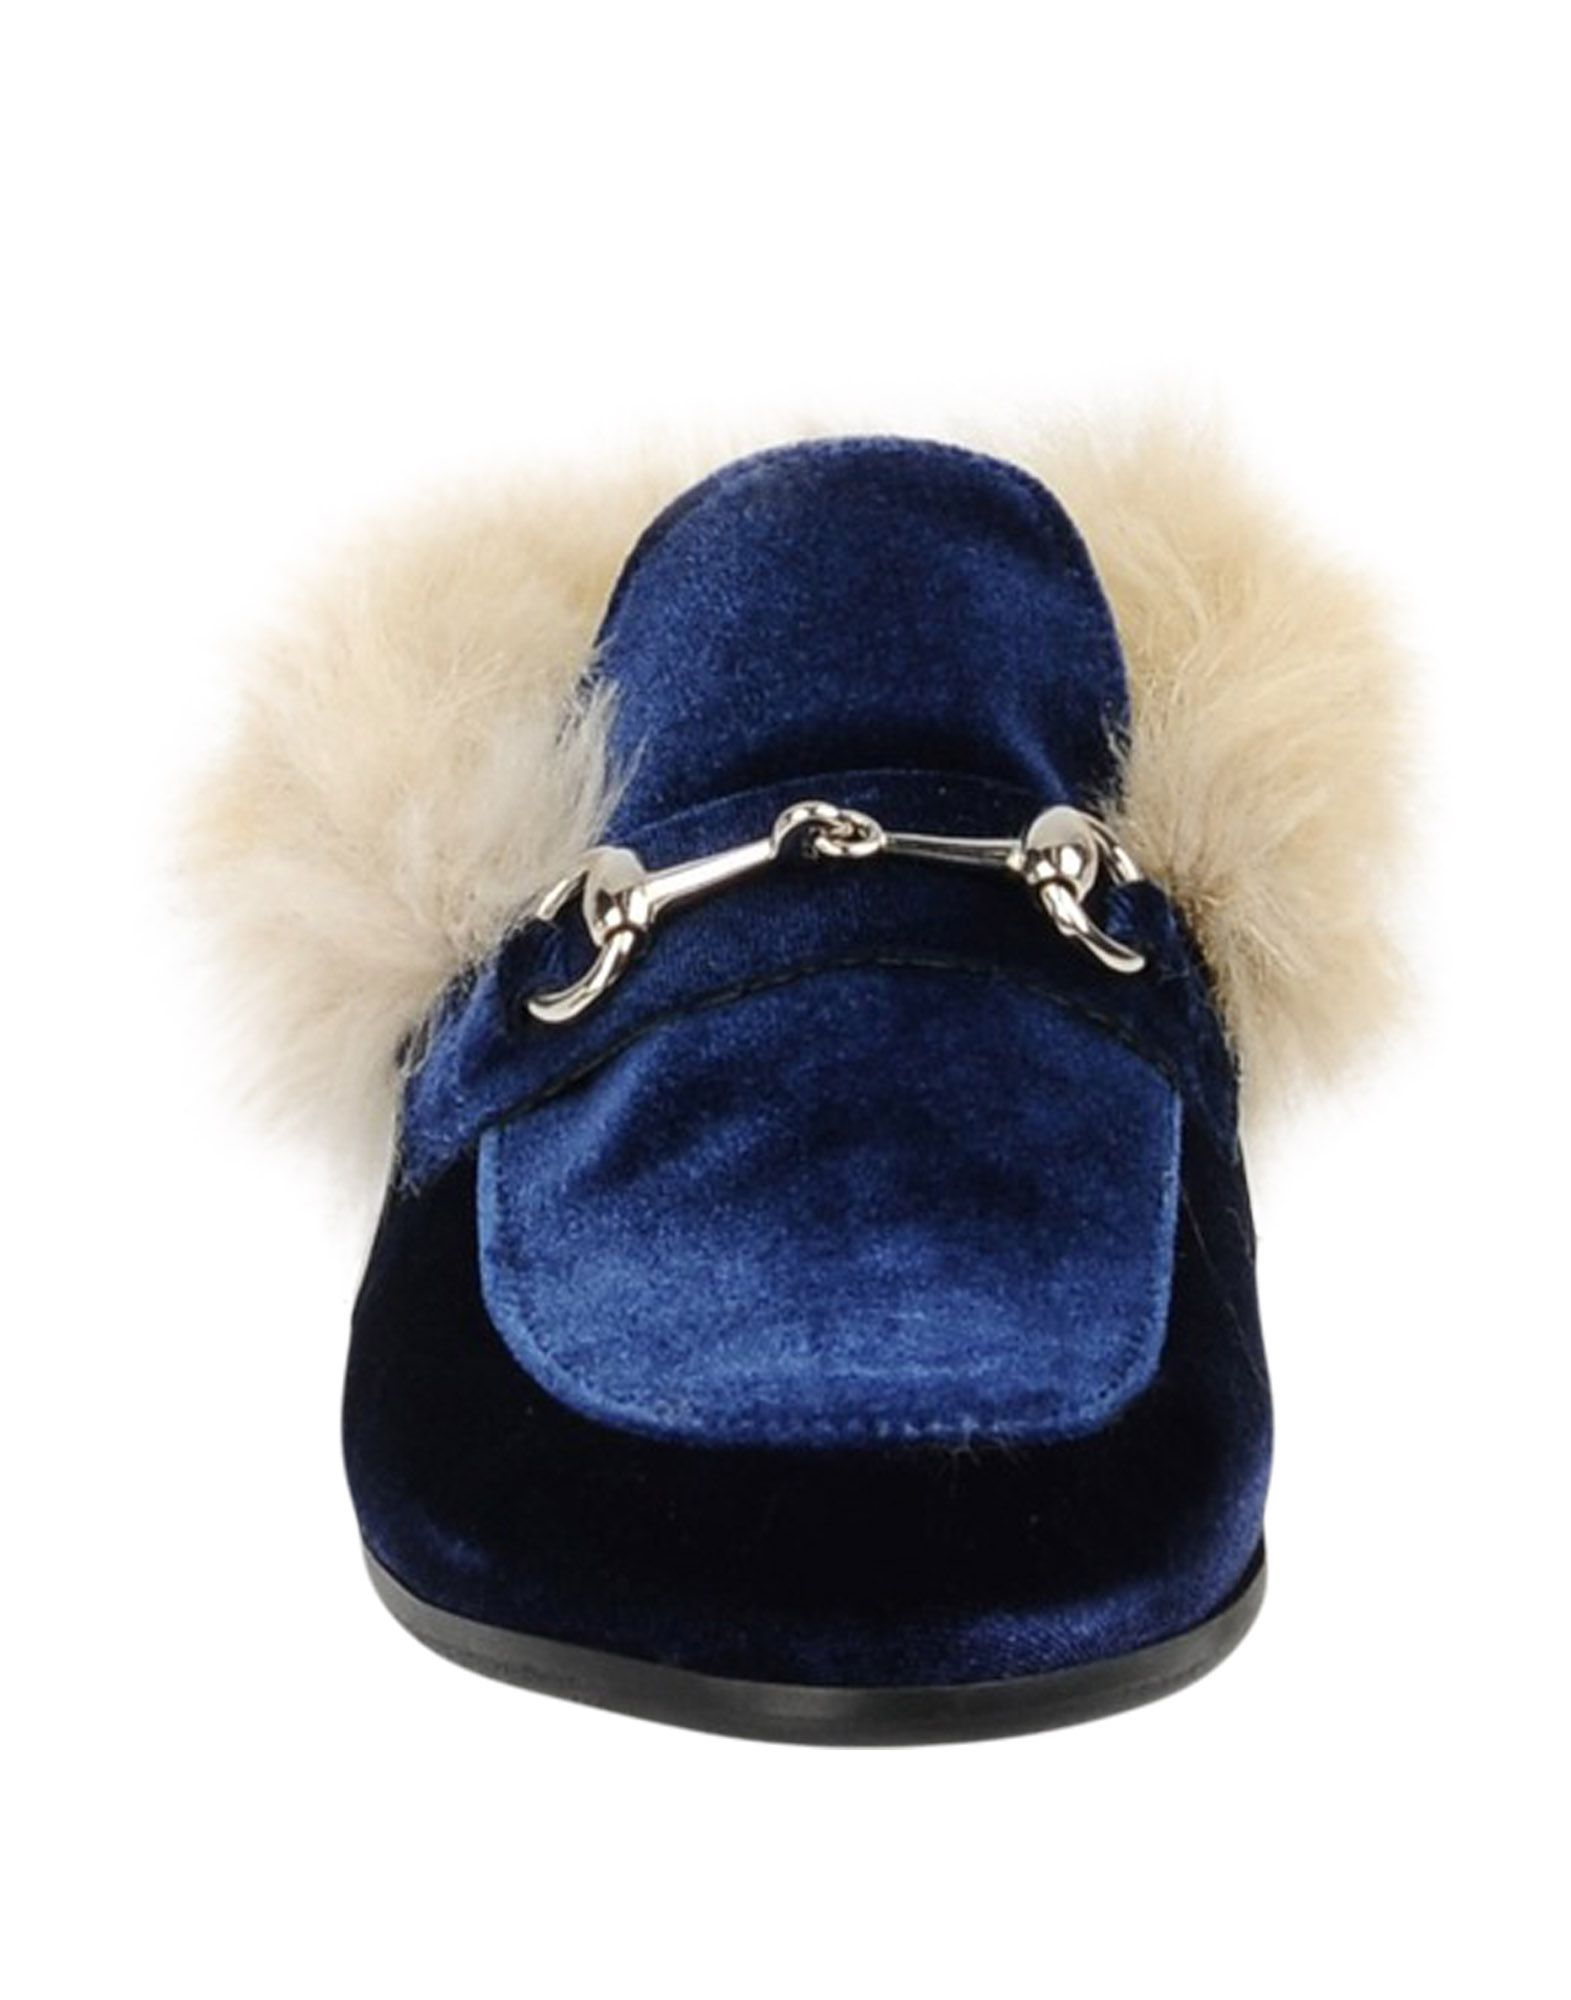 George J. Love Pantoletten Damen  11383048WM Gute Gute 11383048WM Qualität beliebte Schuhe 720a98